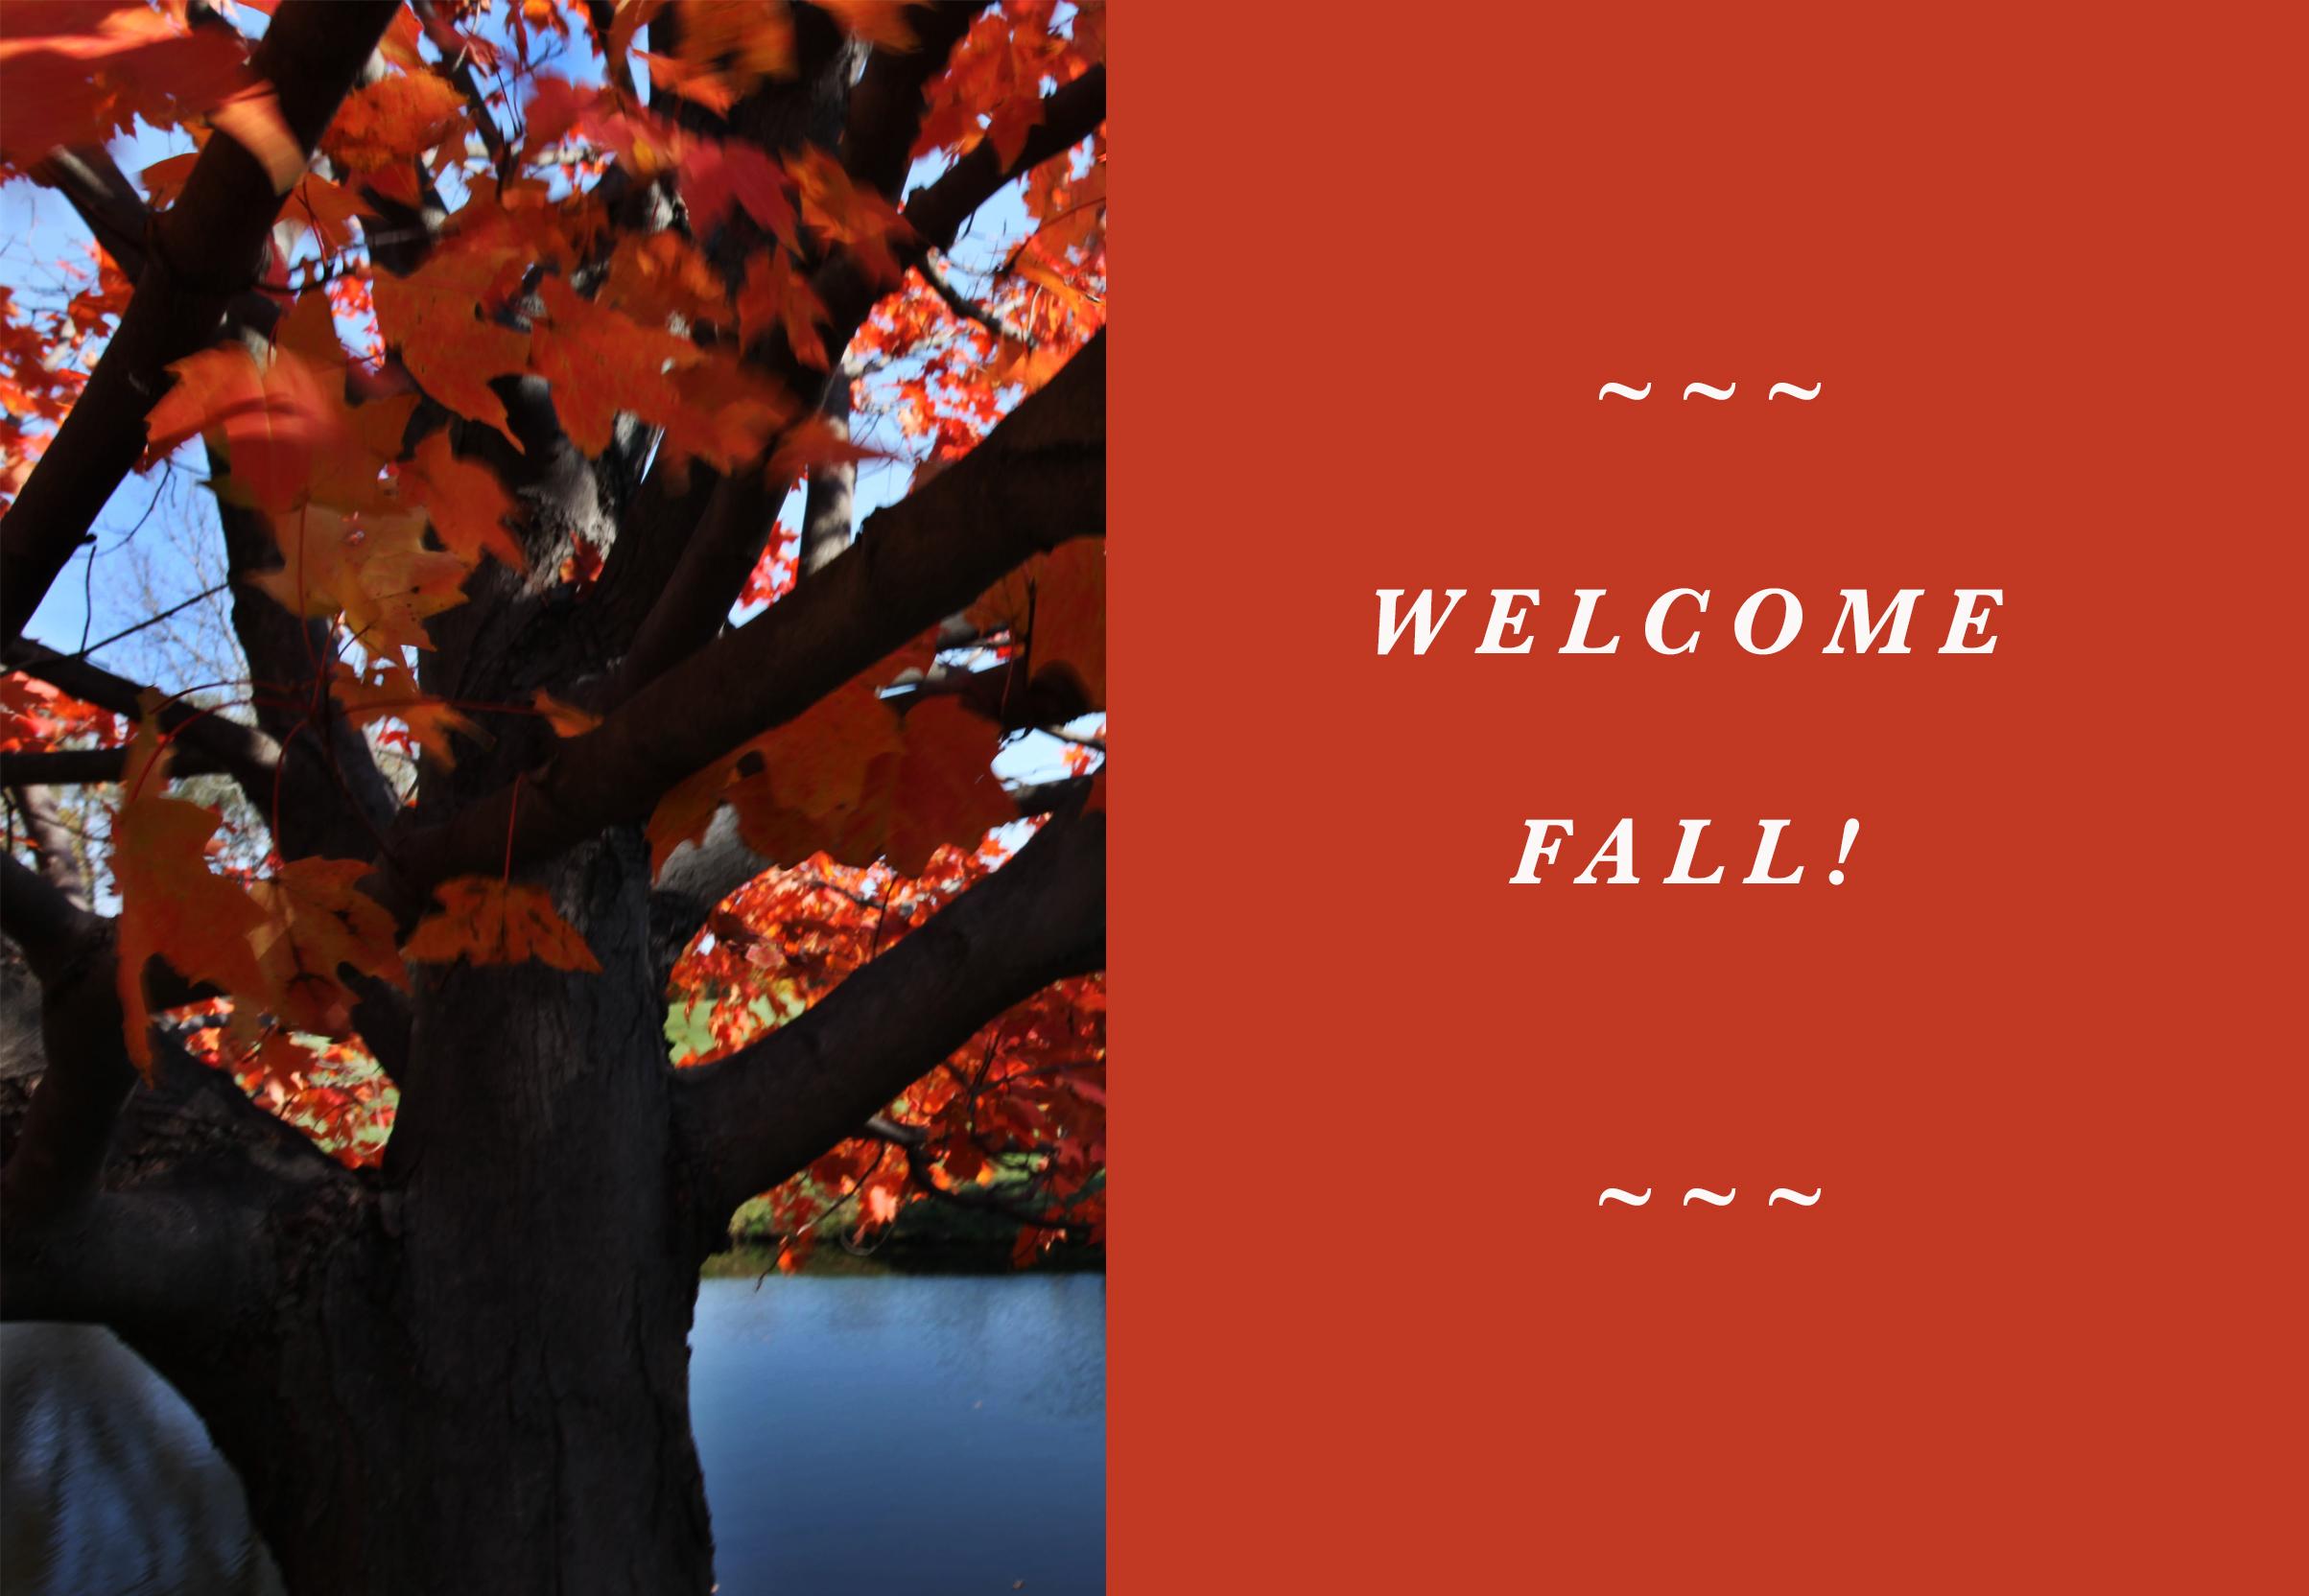 welcomefall!